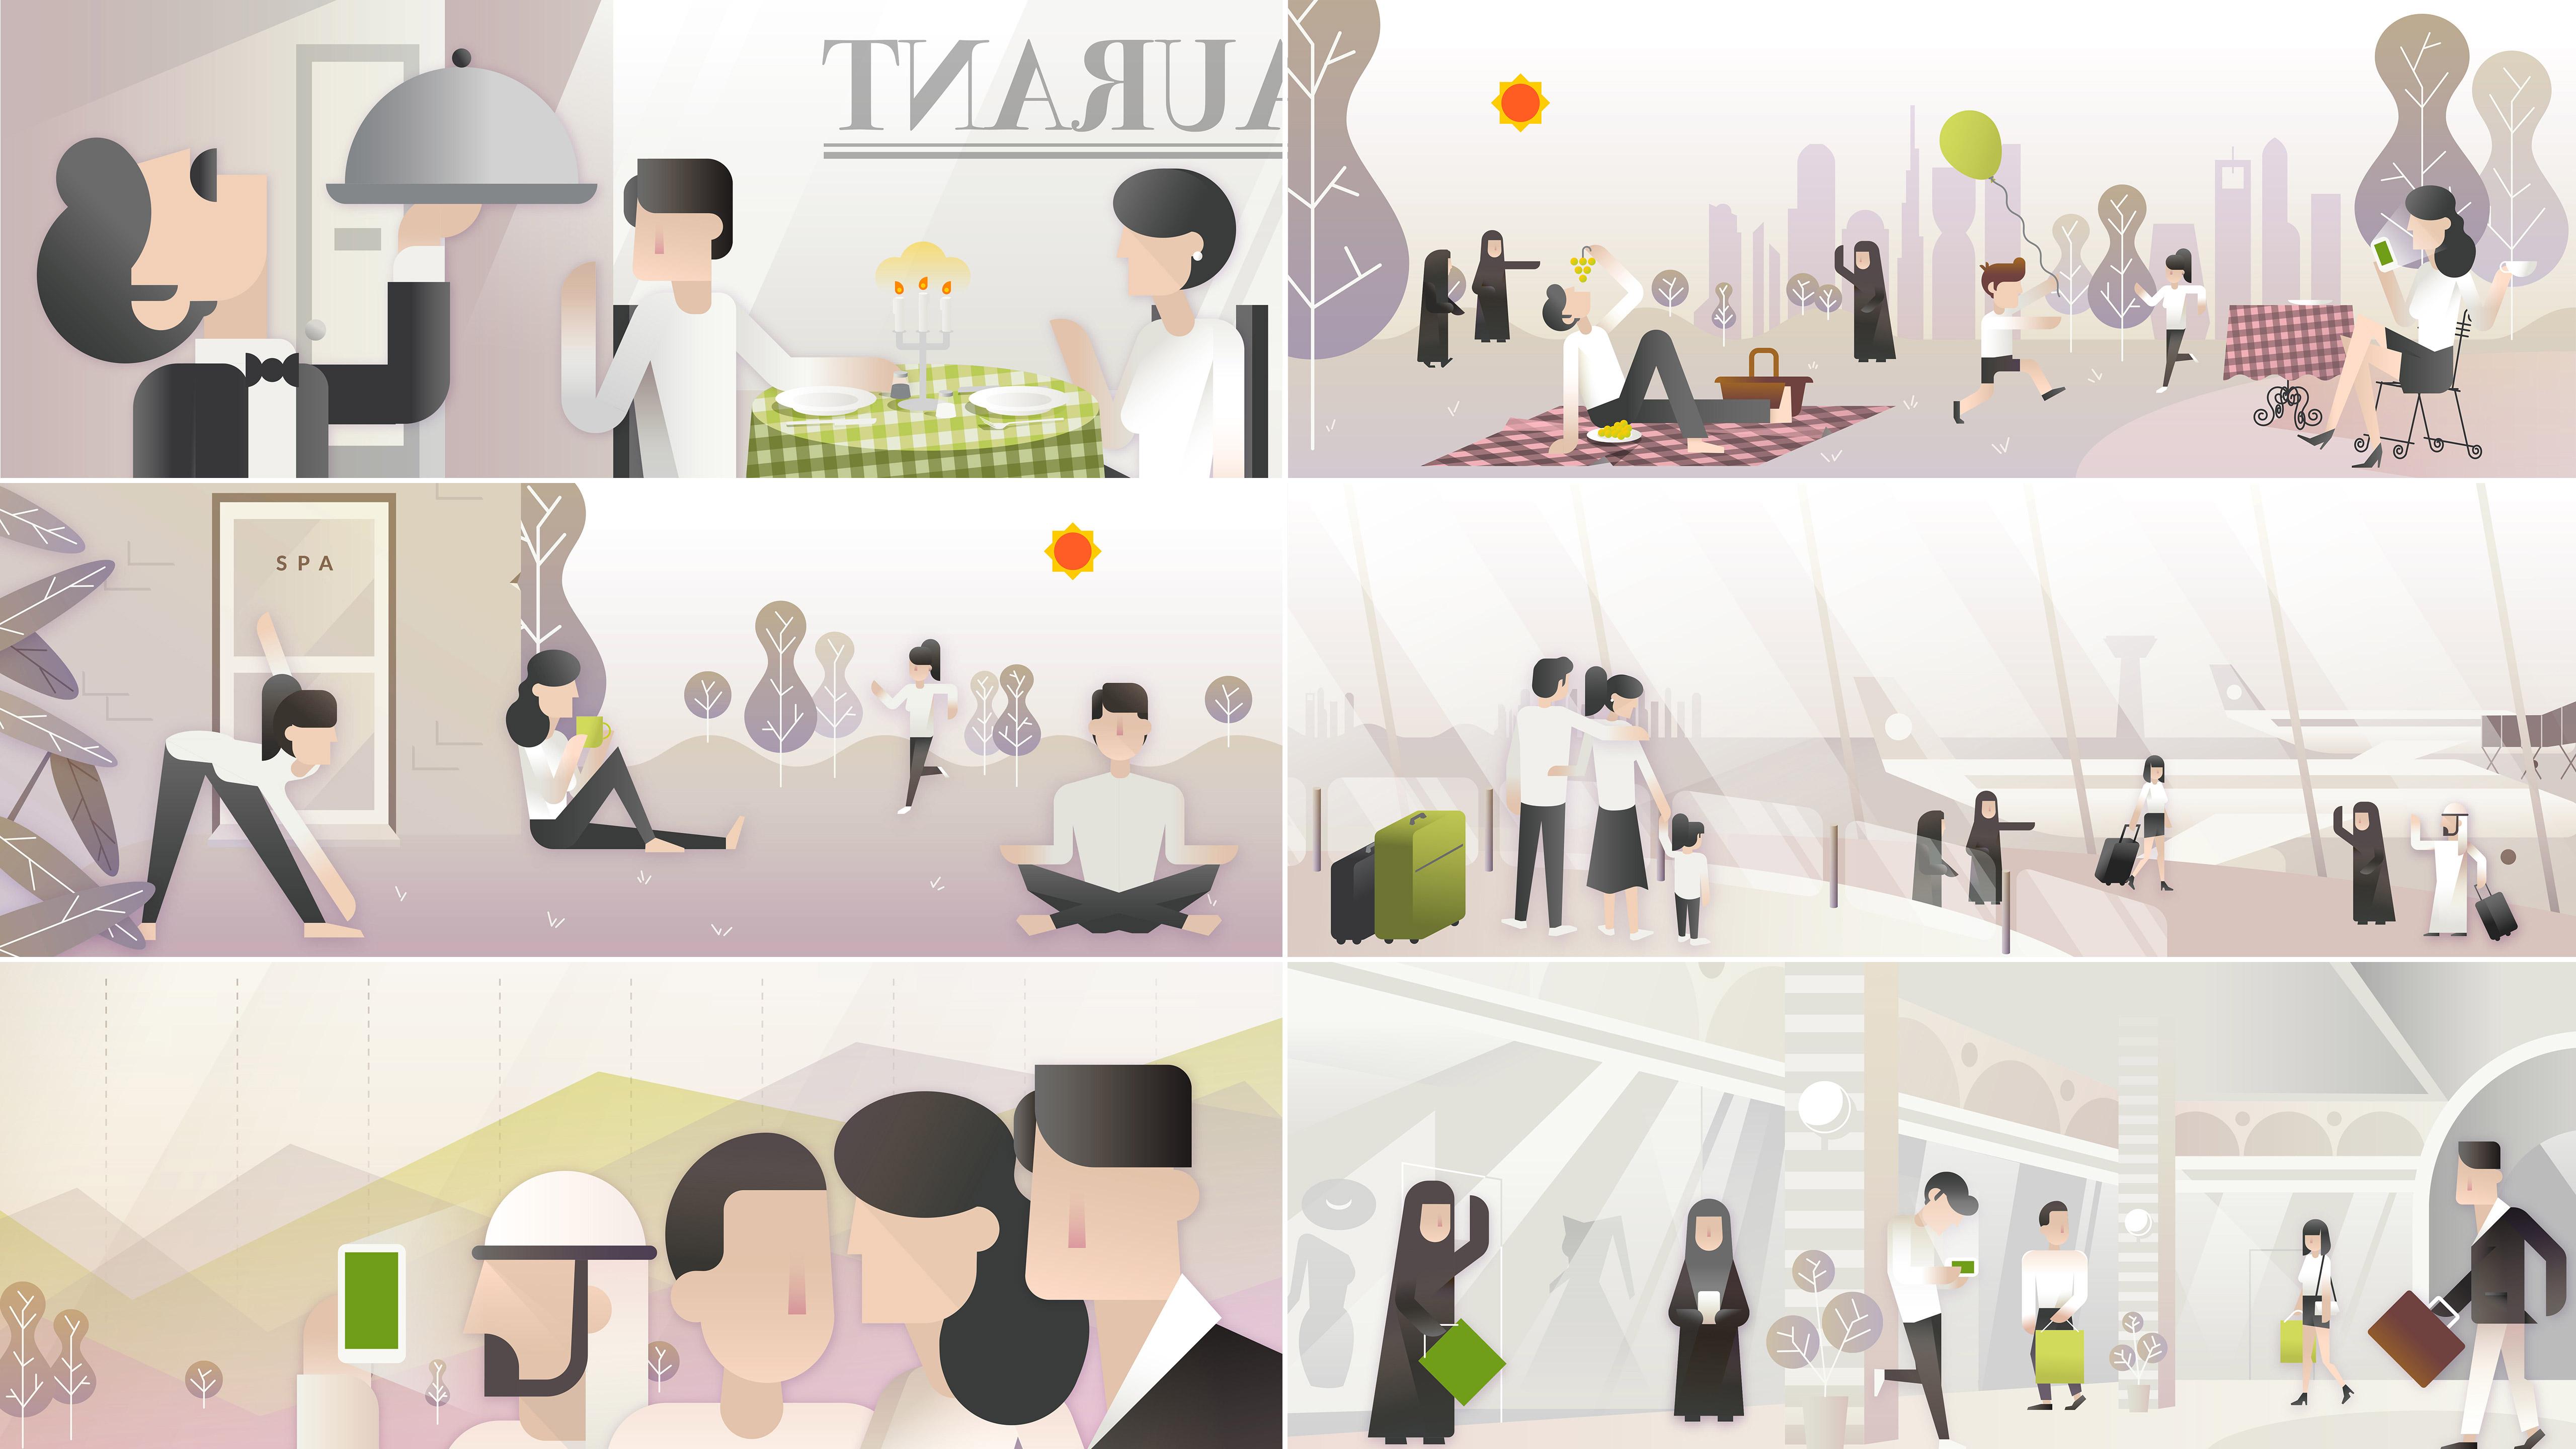 etisalat_design_system_014